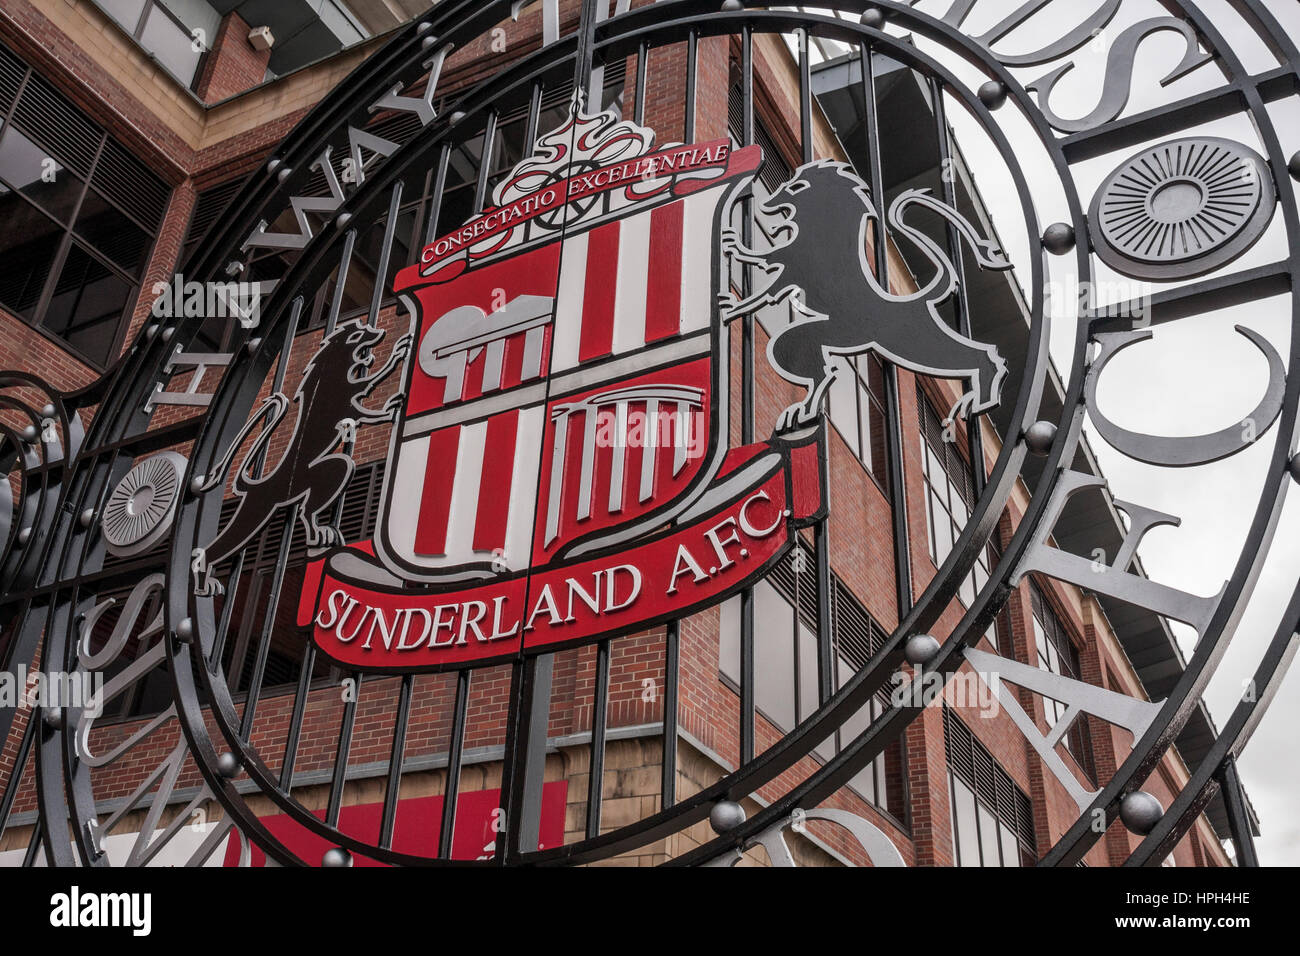 A close up of the stadium gates and crest at the Stadium of Light, Sunderland, England,UK - Stock Image